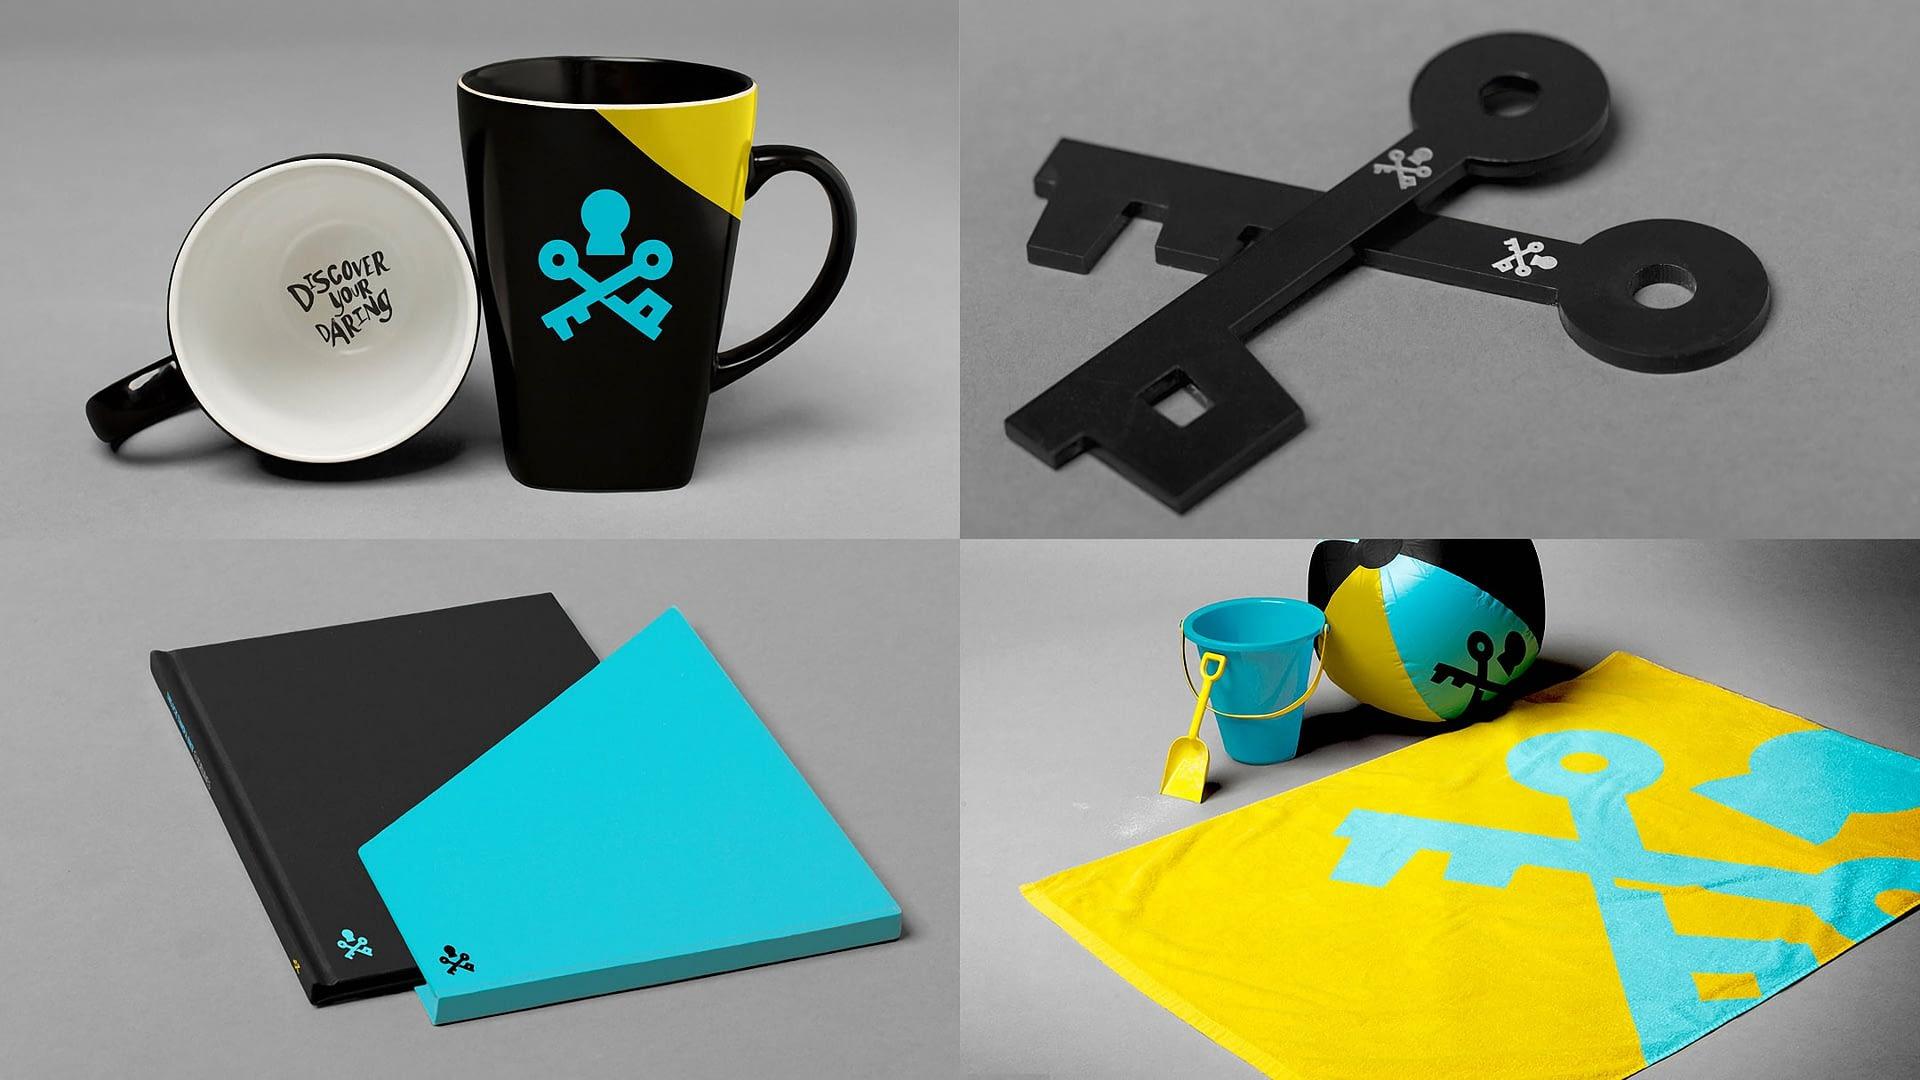 Coffee mugs, branded keys, brand book with holder and beach towel, beach ball and beach bucket.